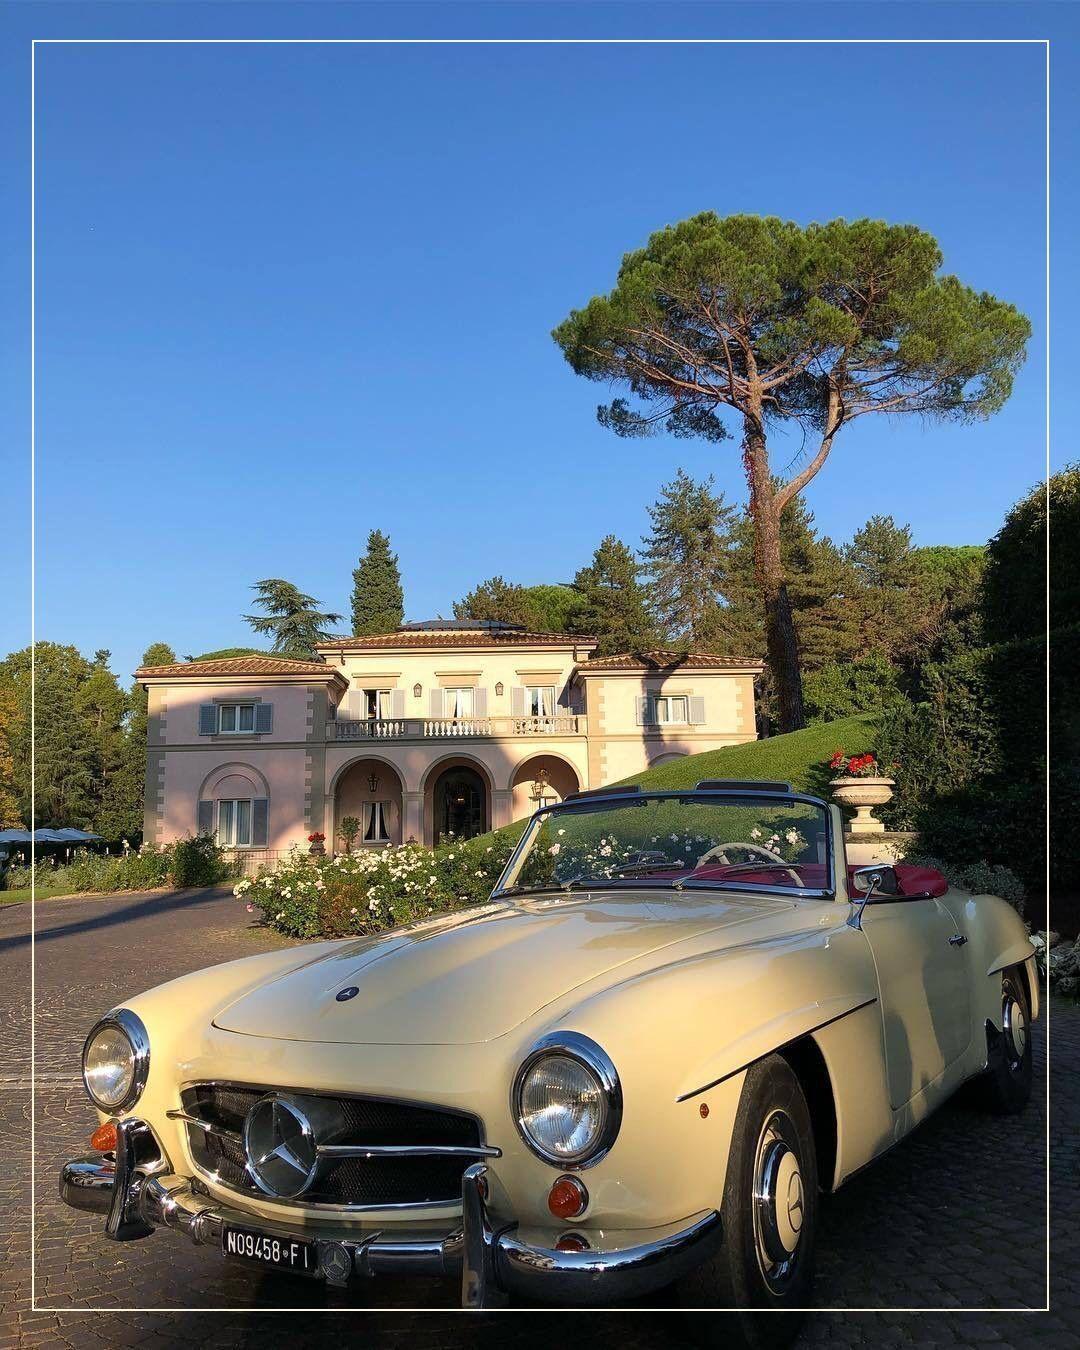 Vintage Motorcycles 80438 vintage cars #car – Classic cars vintage #Cars #classi…